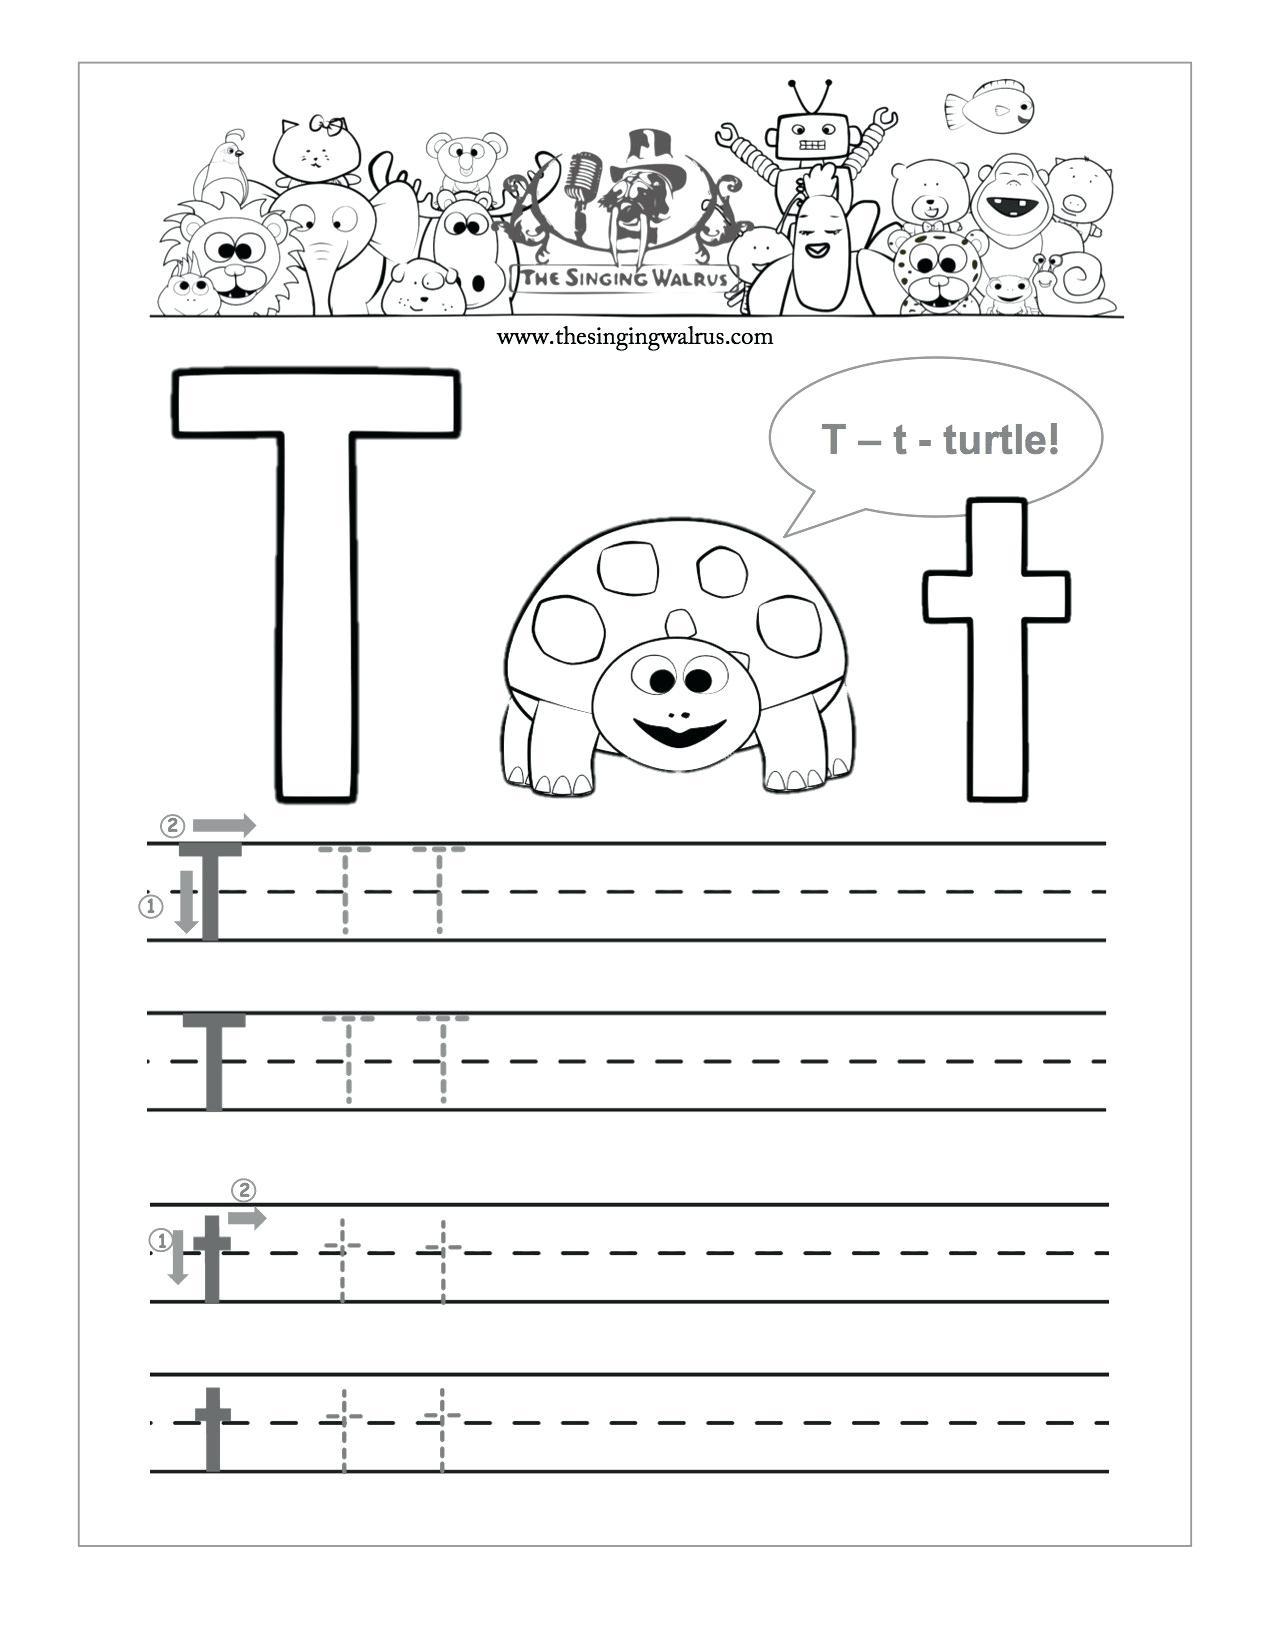 Preschool Letter Tracing Sheets Free Printable Preschool Worksheets - Free Printable Preschool Worksheets